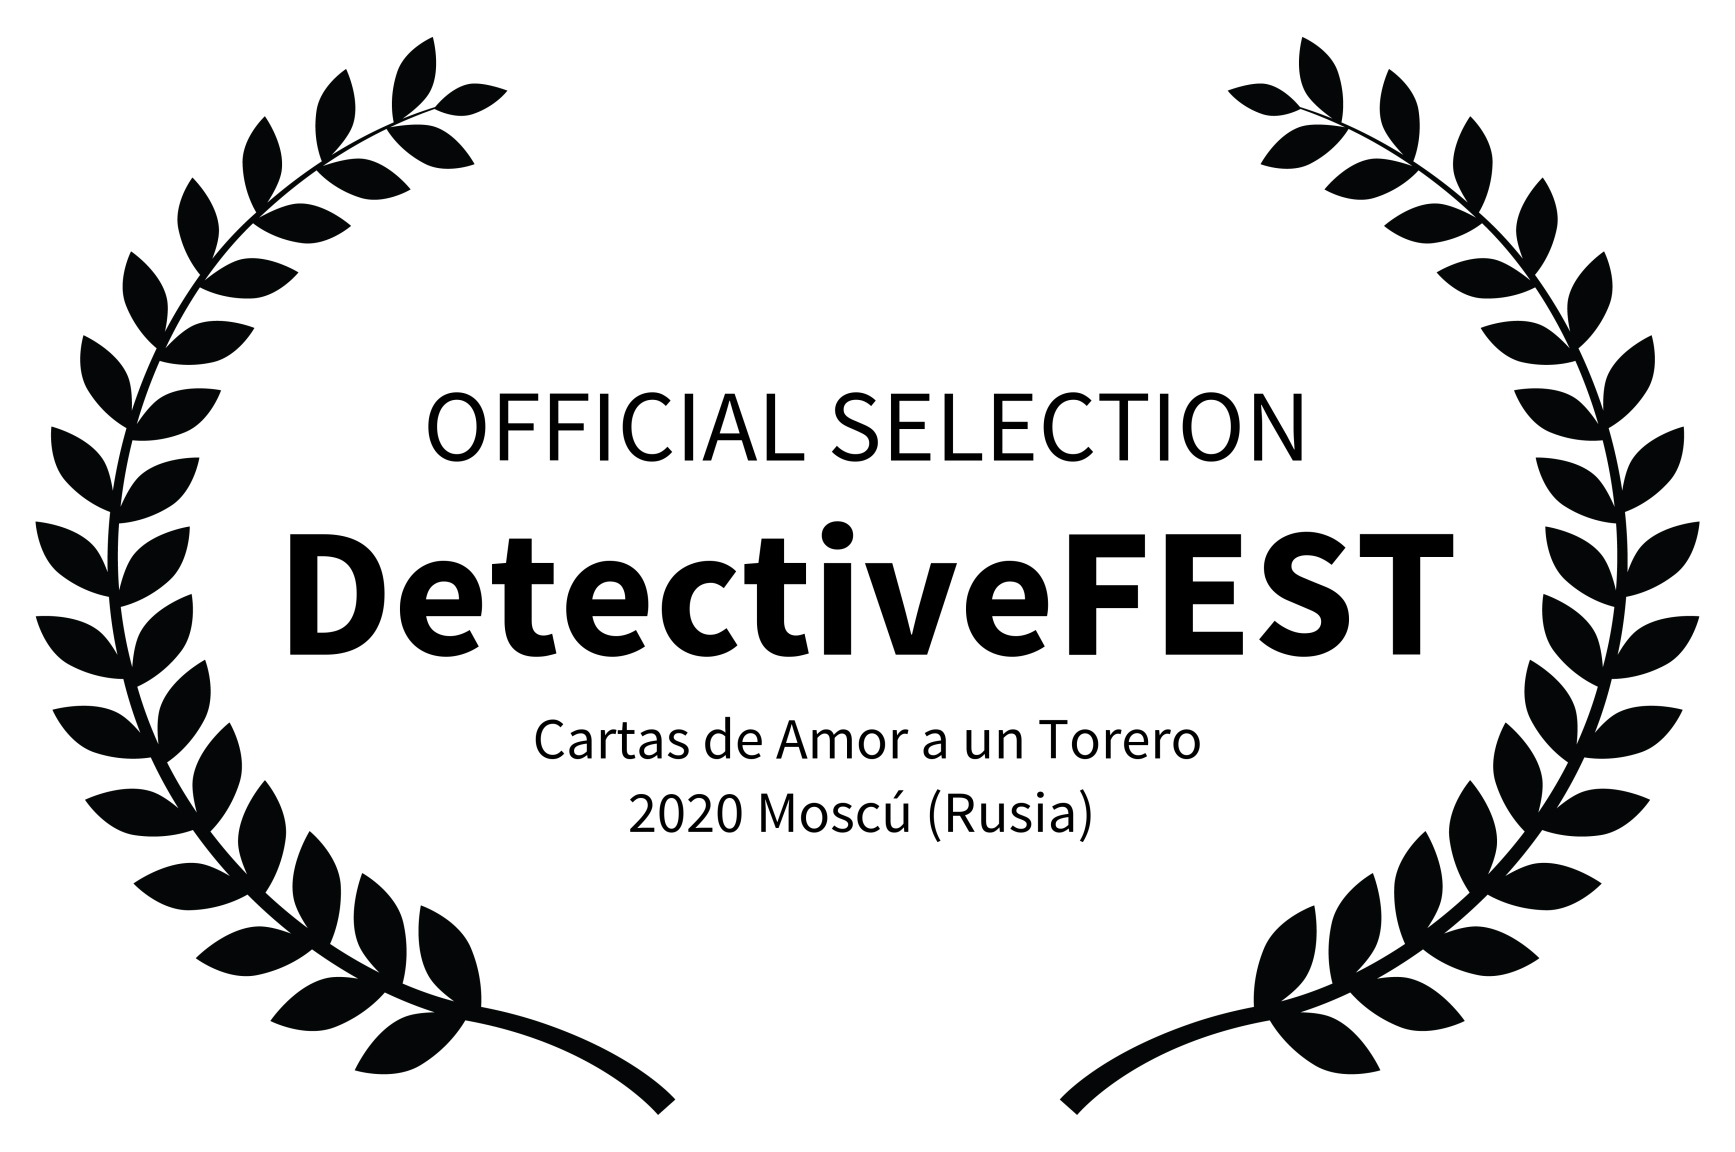 OFFICIAL SELECTION - DetectiveFEST  - Ca